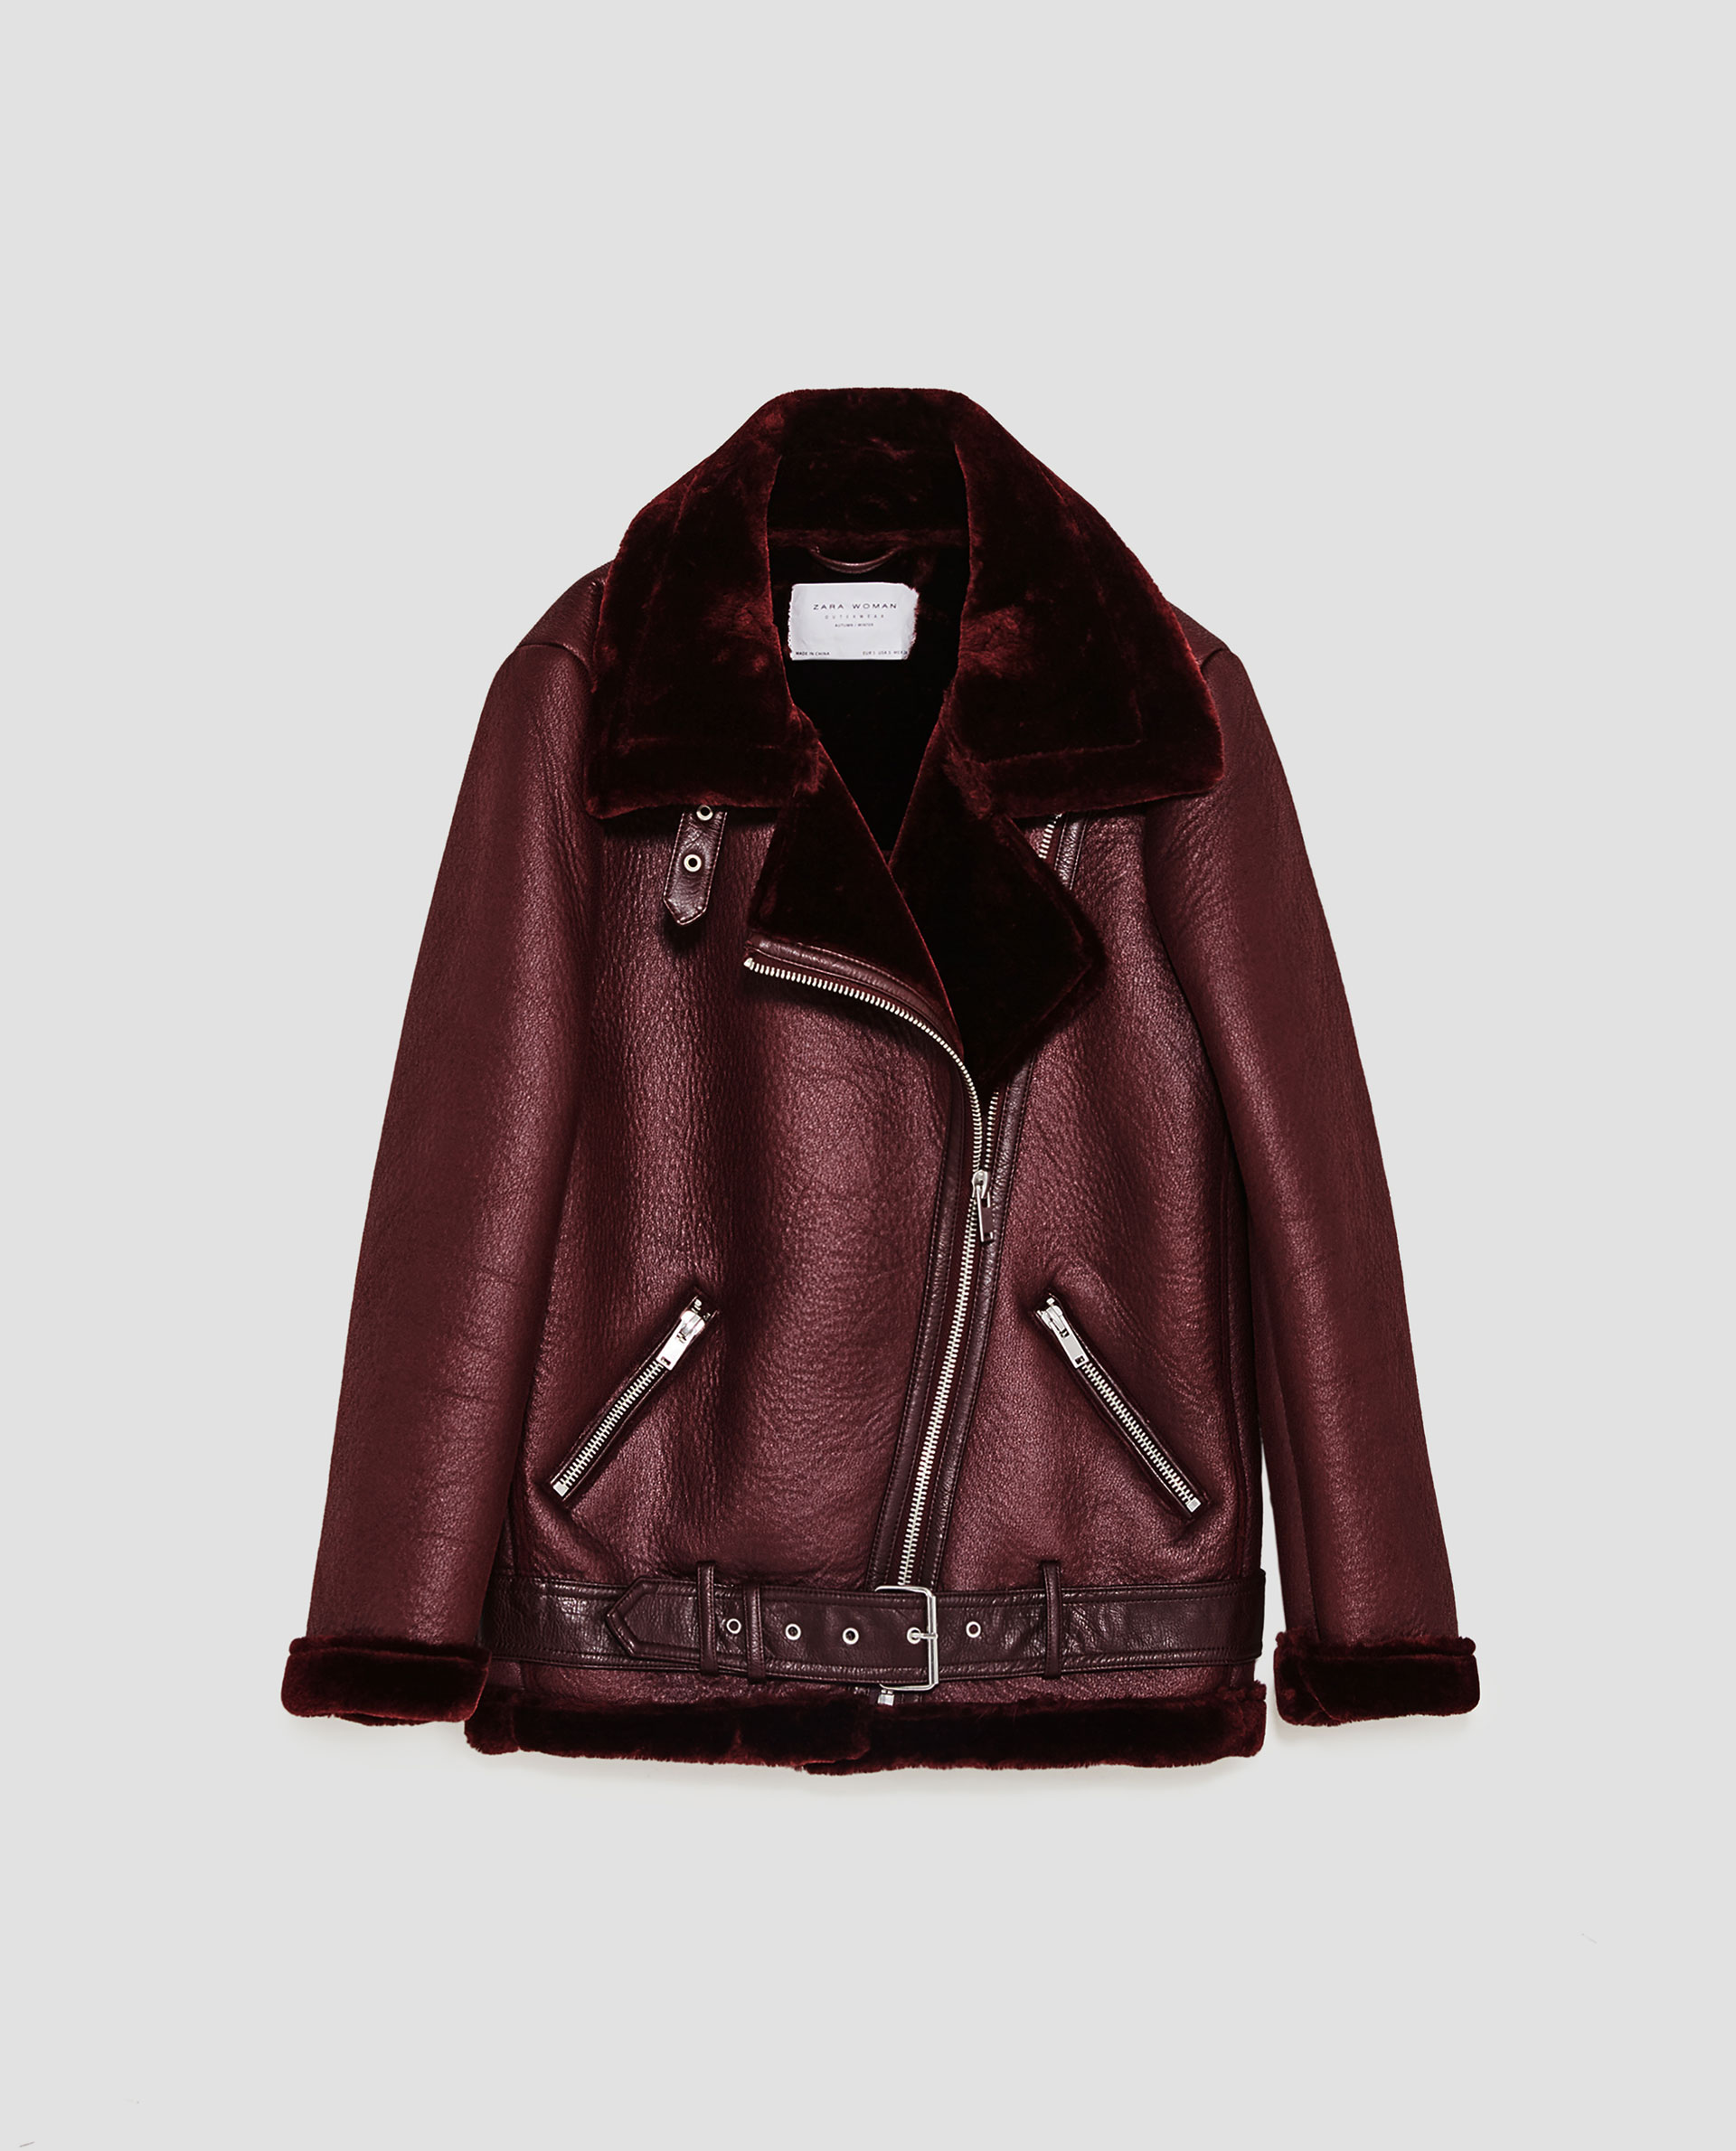 Veste en cuir marron femme zara